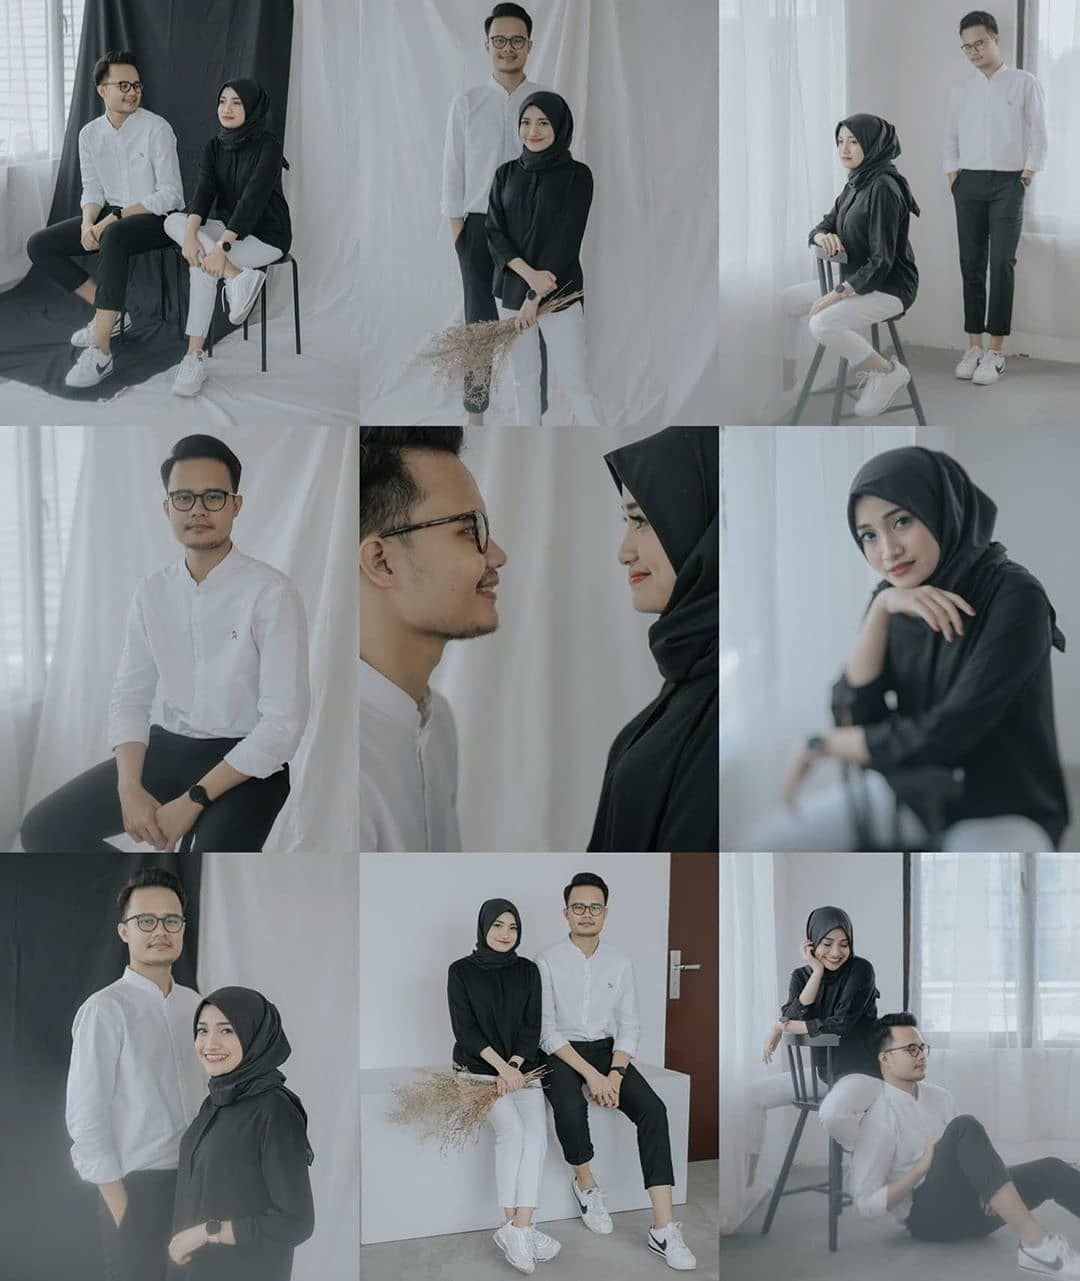 Ide Foto Prewedding Dengan Konsep Monokromatik Foto Perkawinan Fotografi Tunangan Fotografi Pengantin